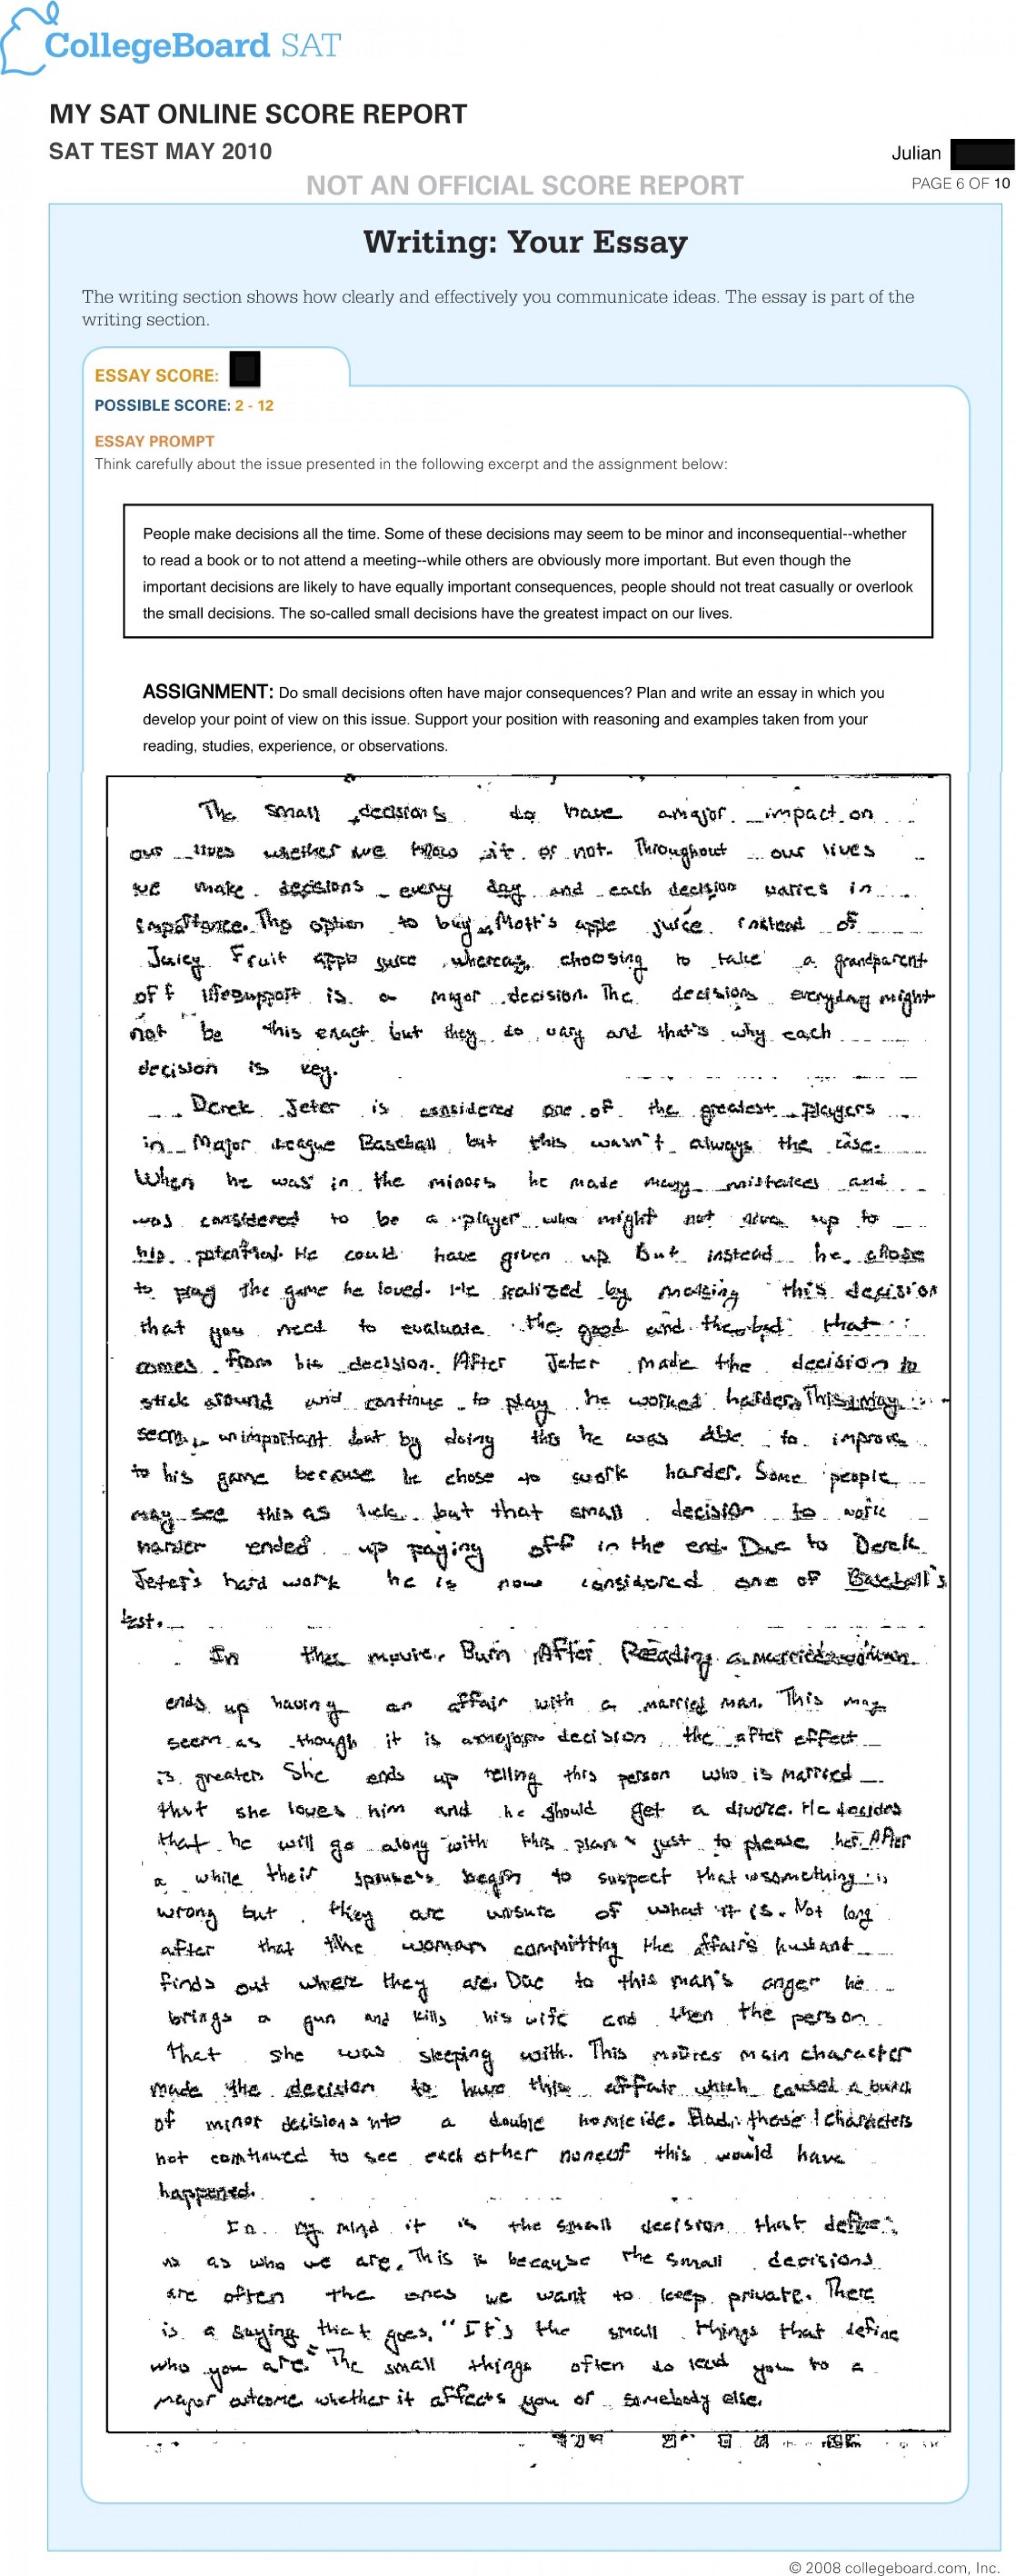 003 Essay Example Jr May Sat Amazing Scoring Score Percentiles 2017 Examples 6 2018 1920